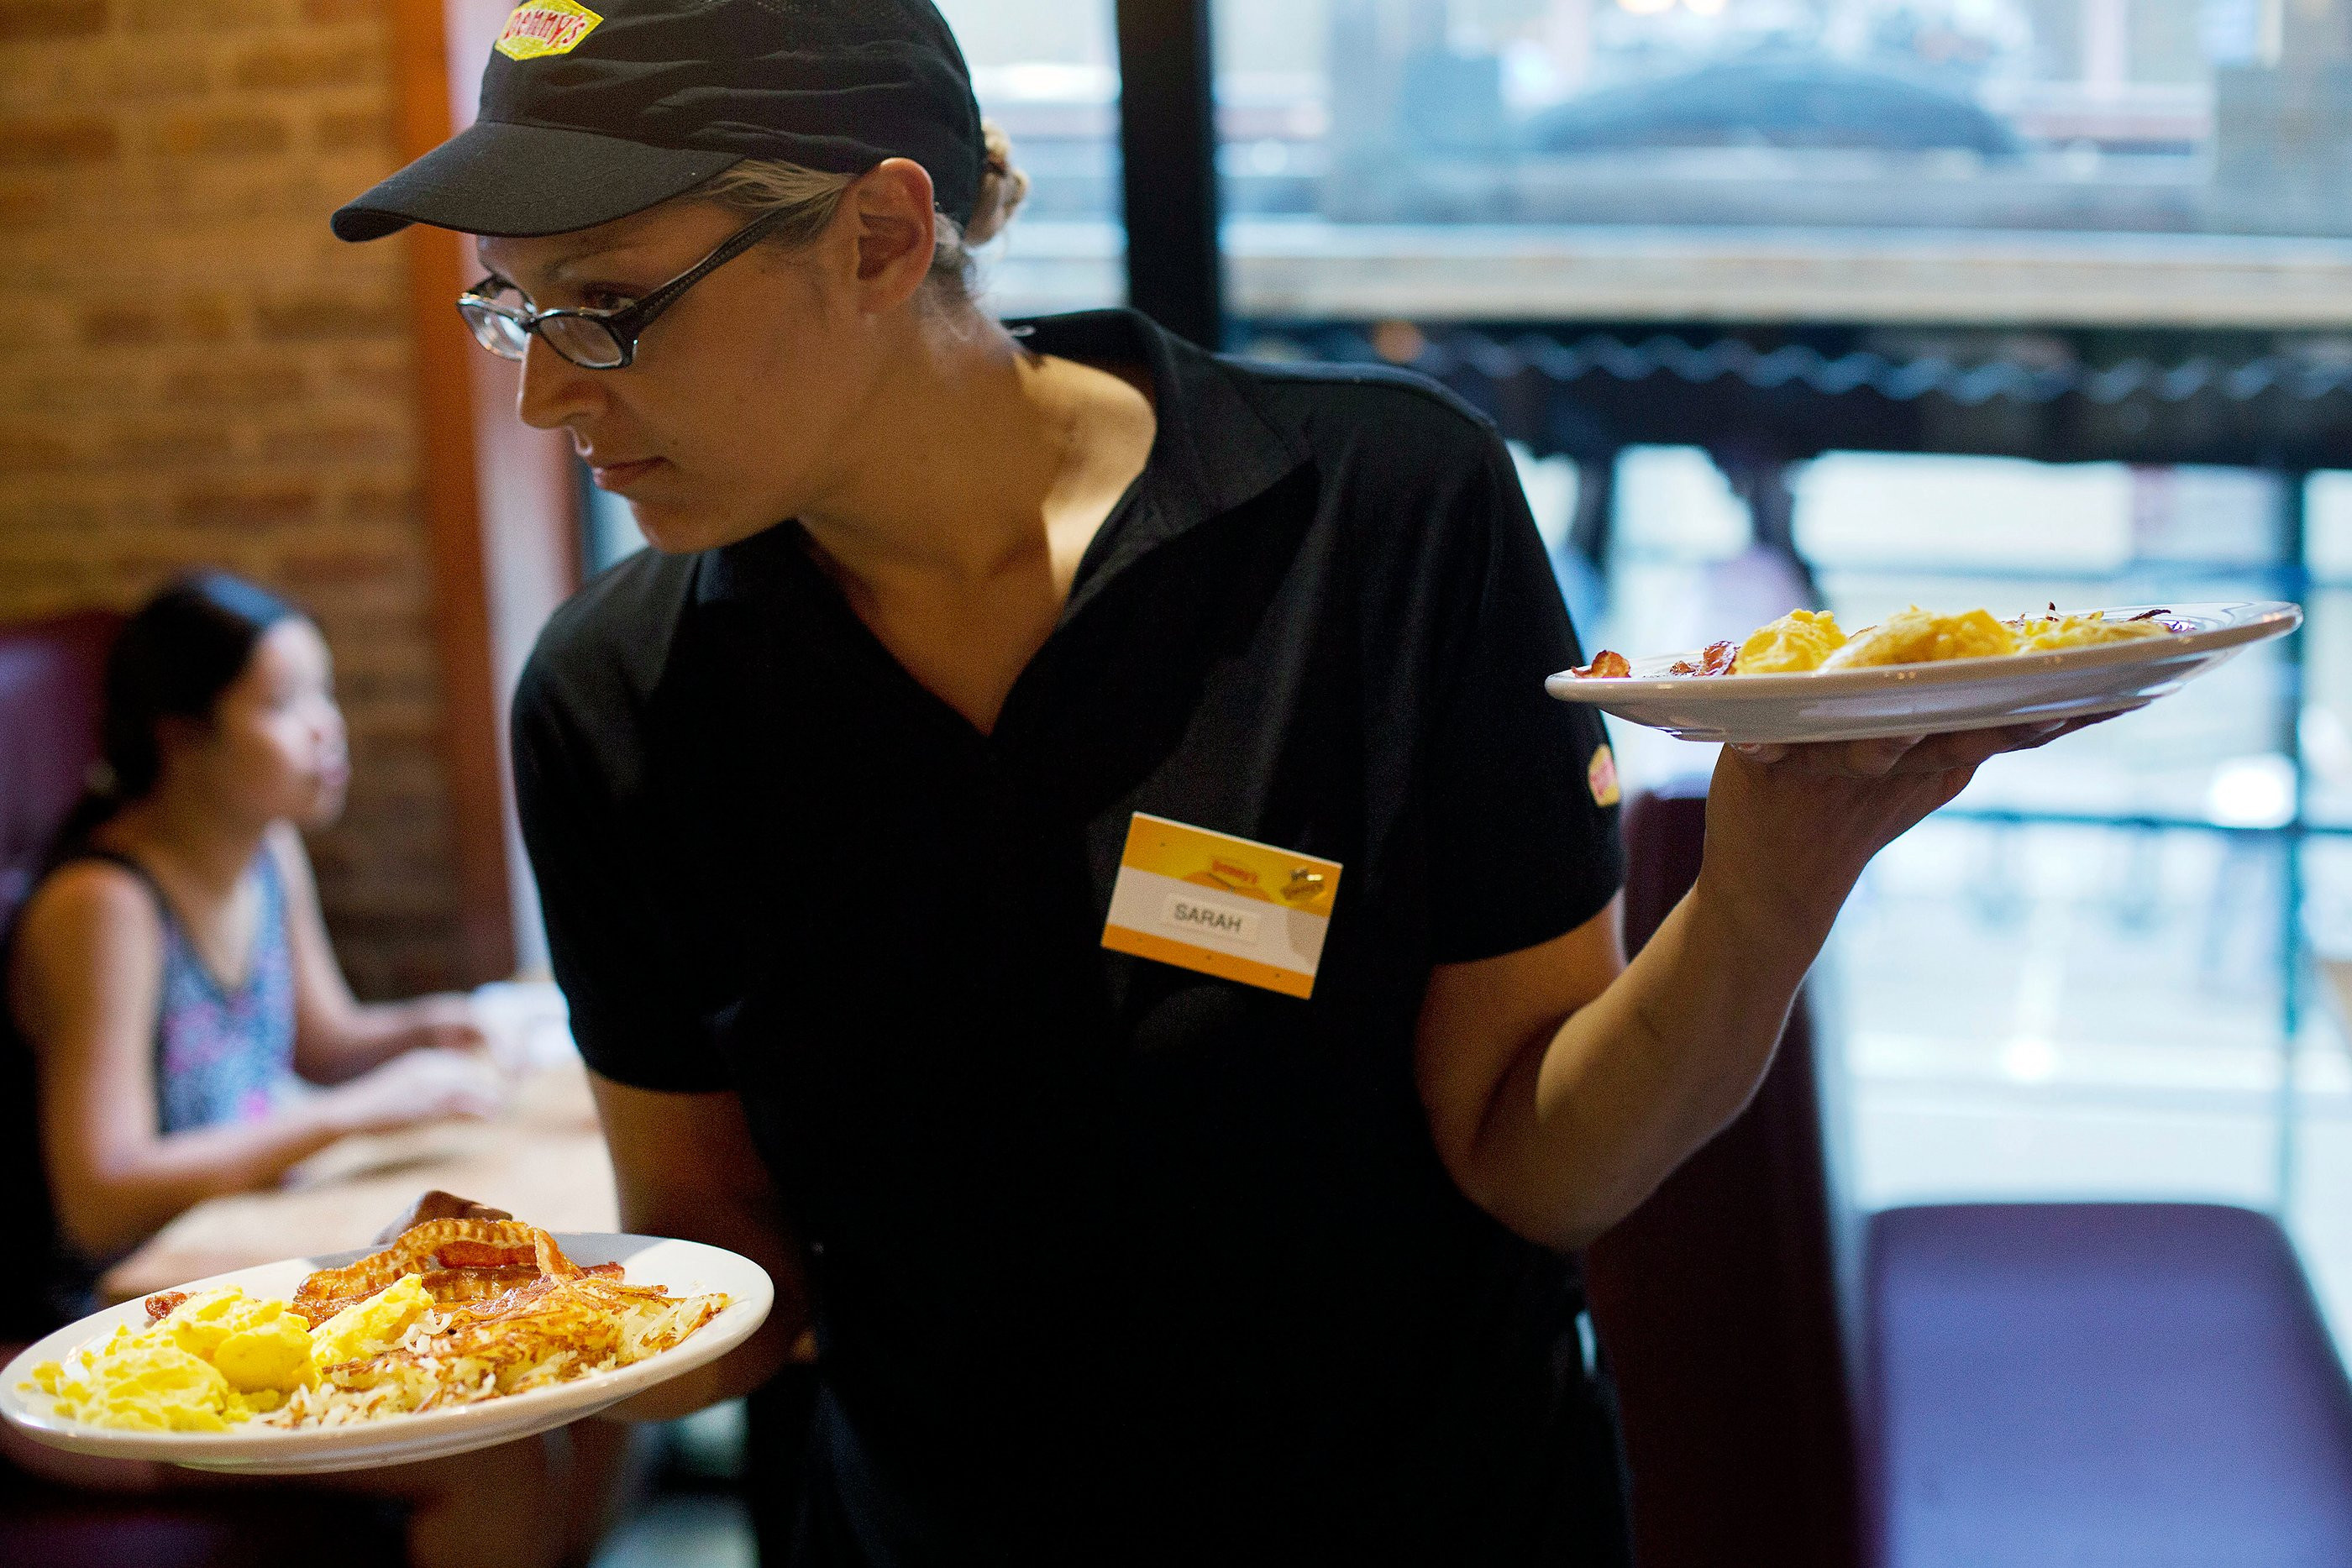 Breakfast Restaurants Open On Thanksgiving  Restaurants Open on Thanksgiving Starbucks Cracker